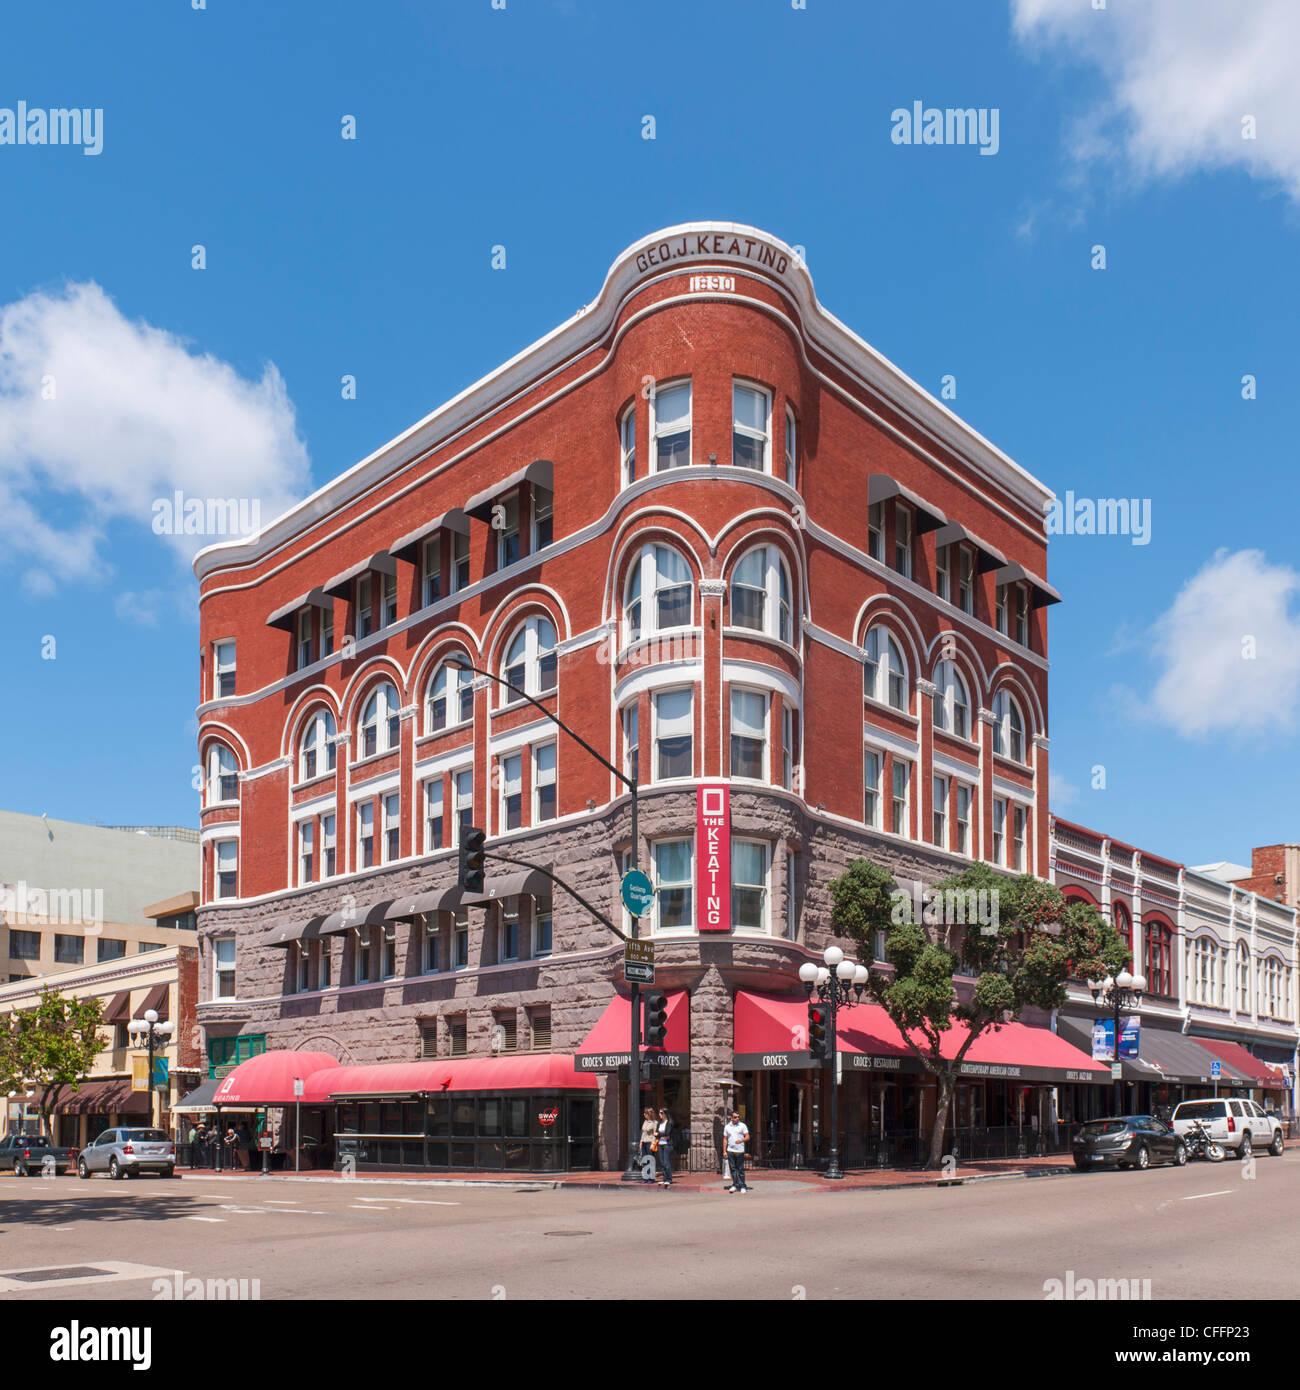 Keating Hotel, San Diego - Stock Image